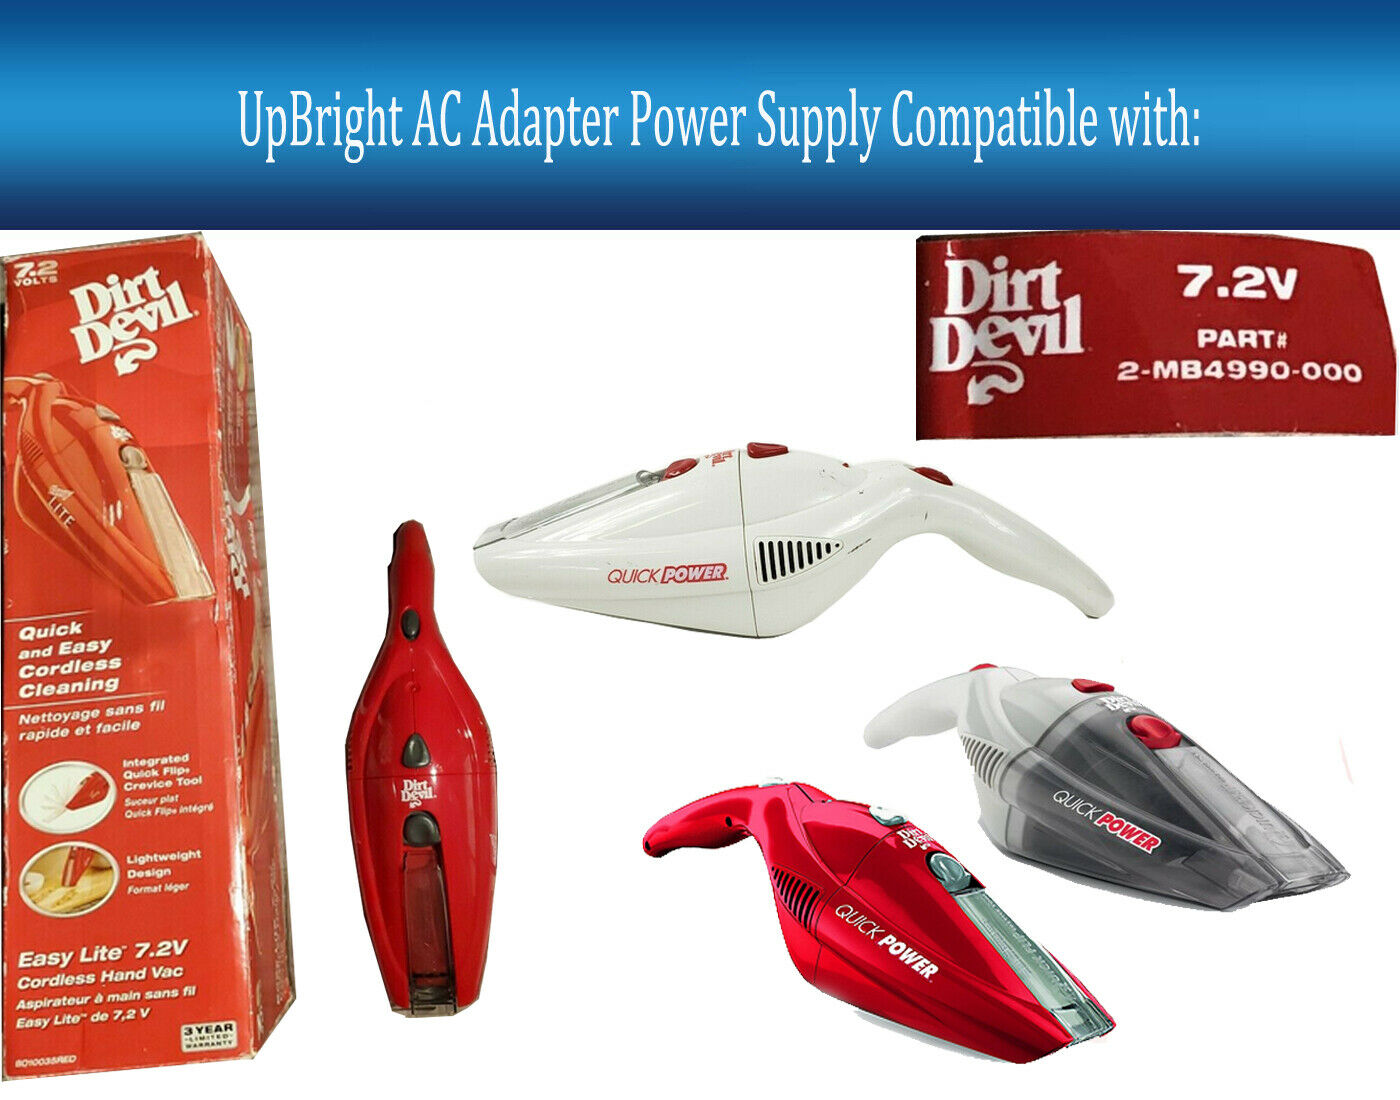 dirt devil bd10035 handheld vac charging base and power supply